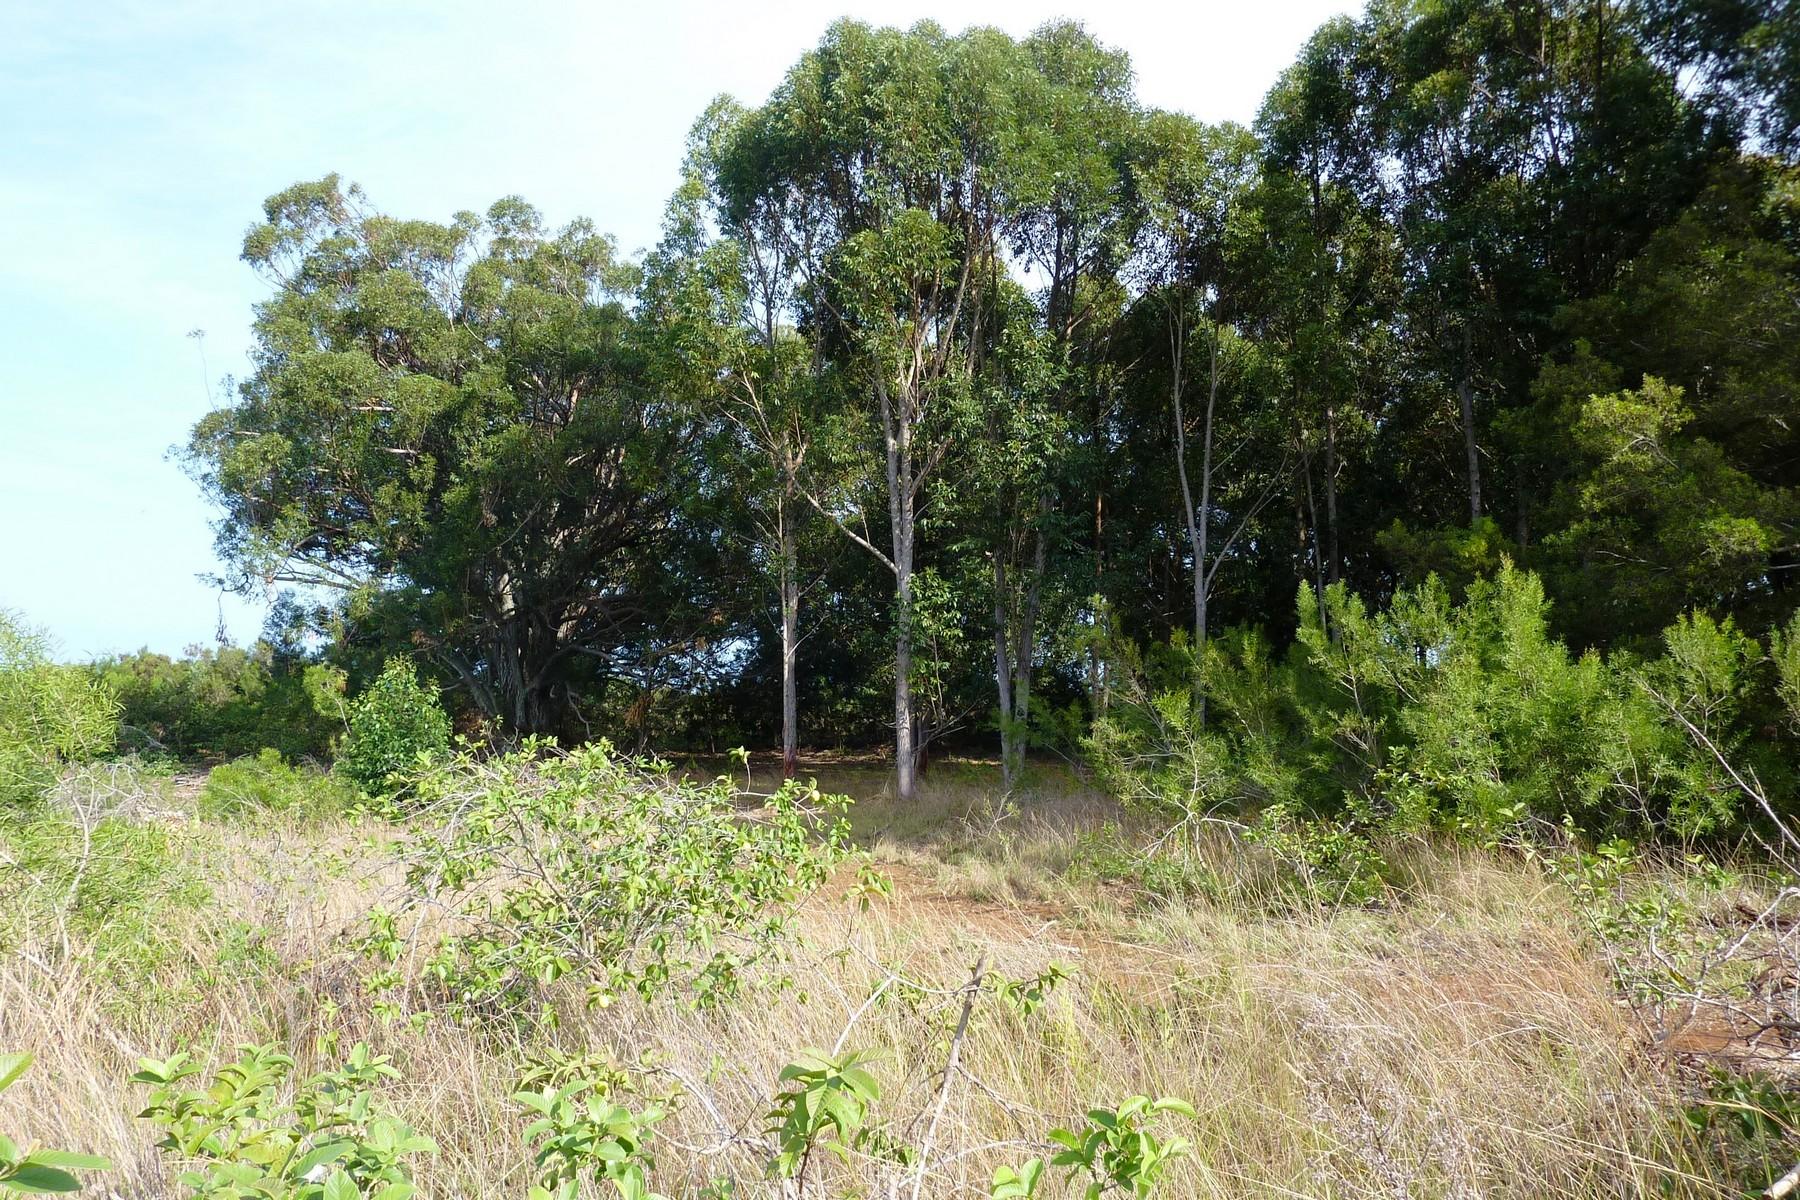 Land for Sale at Kauhikoa Road, Haikku-2 Acres, 2 Miles from Makawao Town 0 Kauhikoa Road, Haiku, Hawaii, 96708 United States